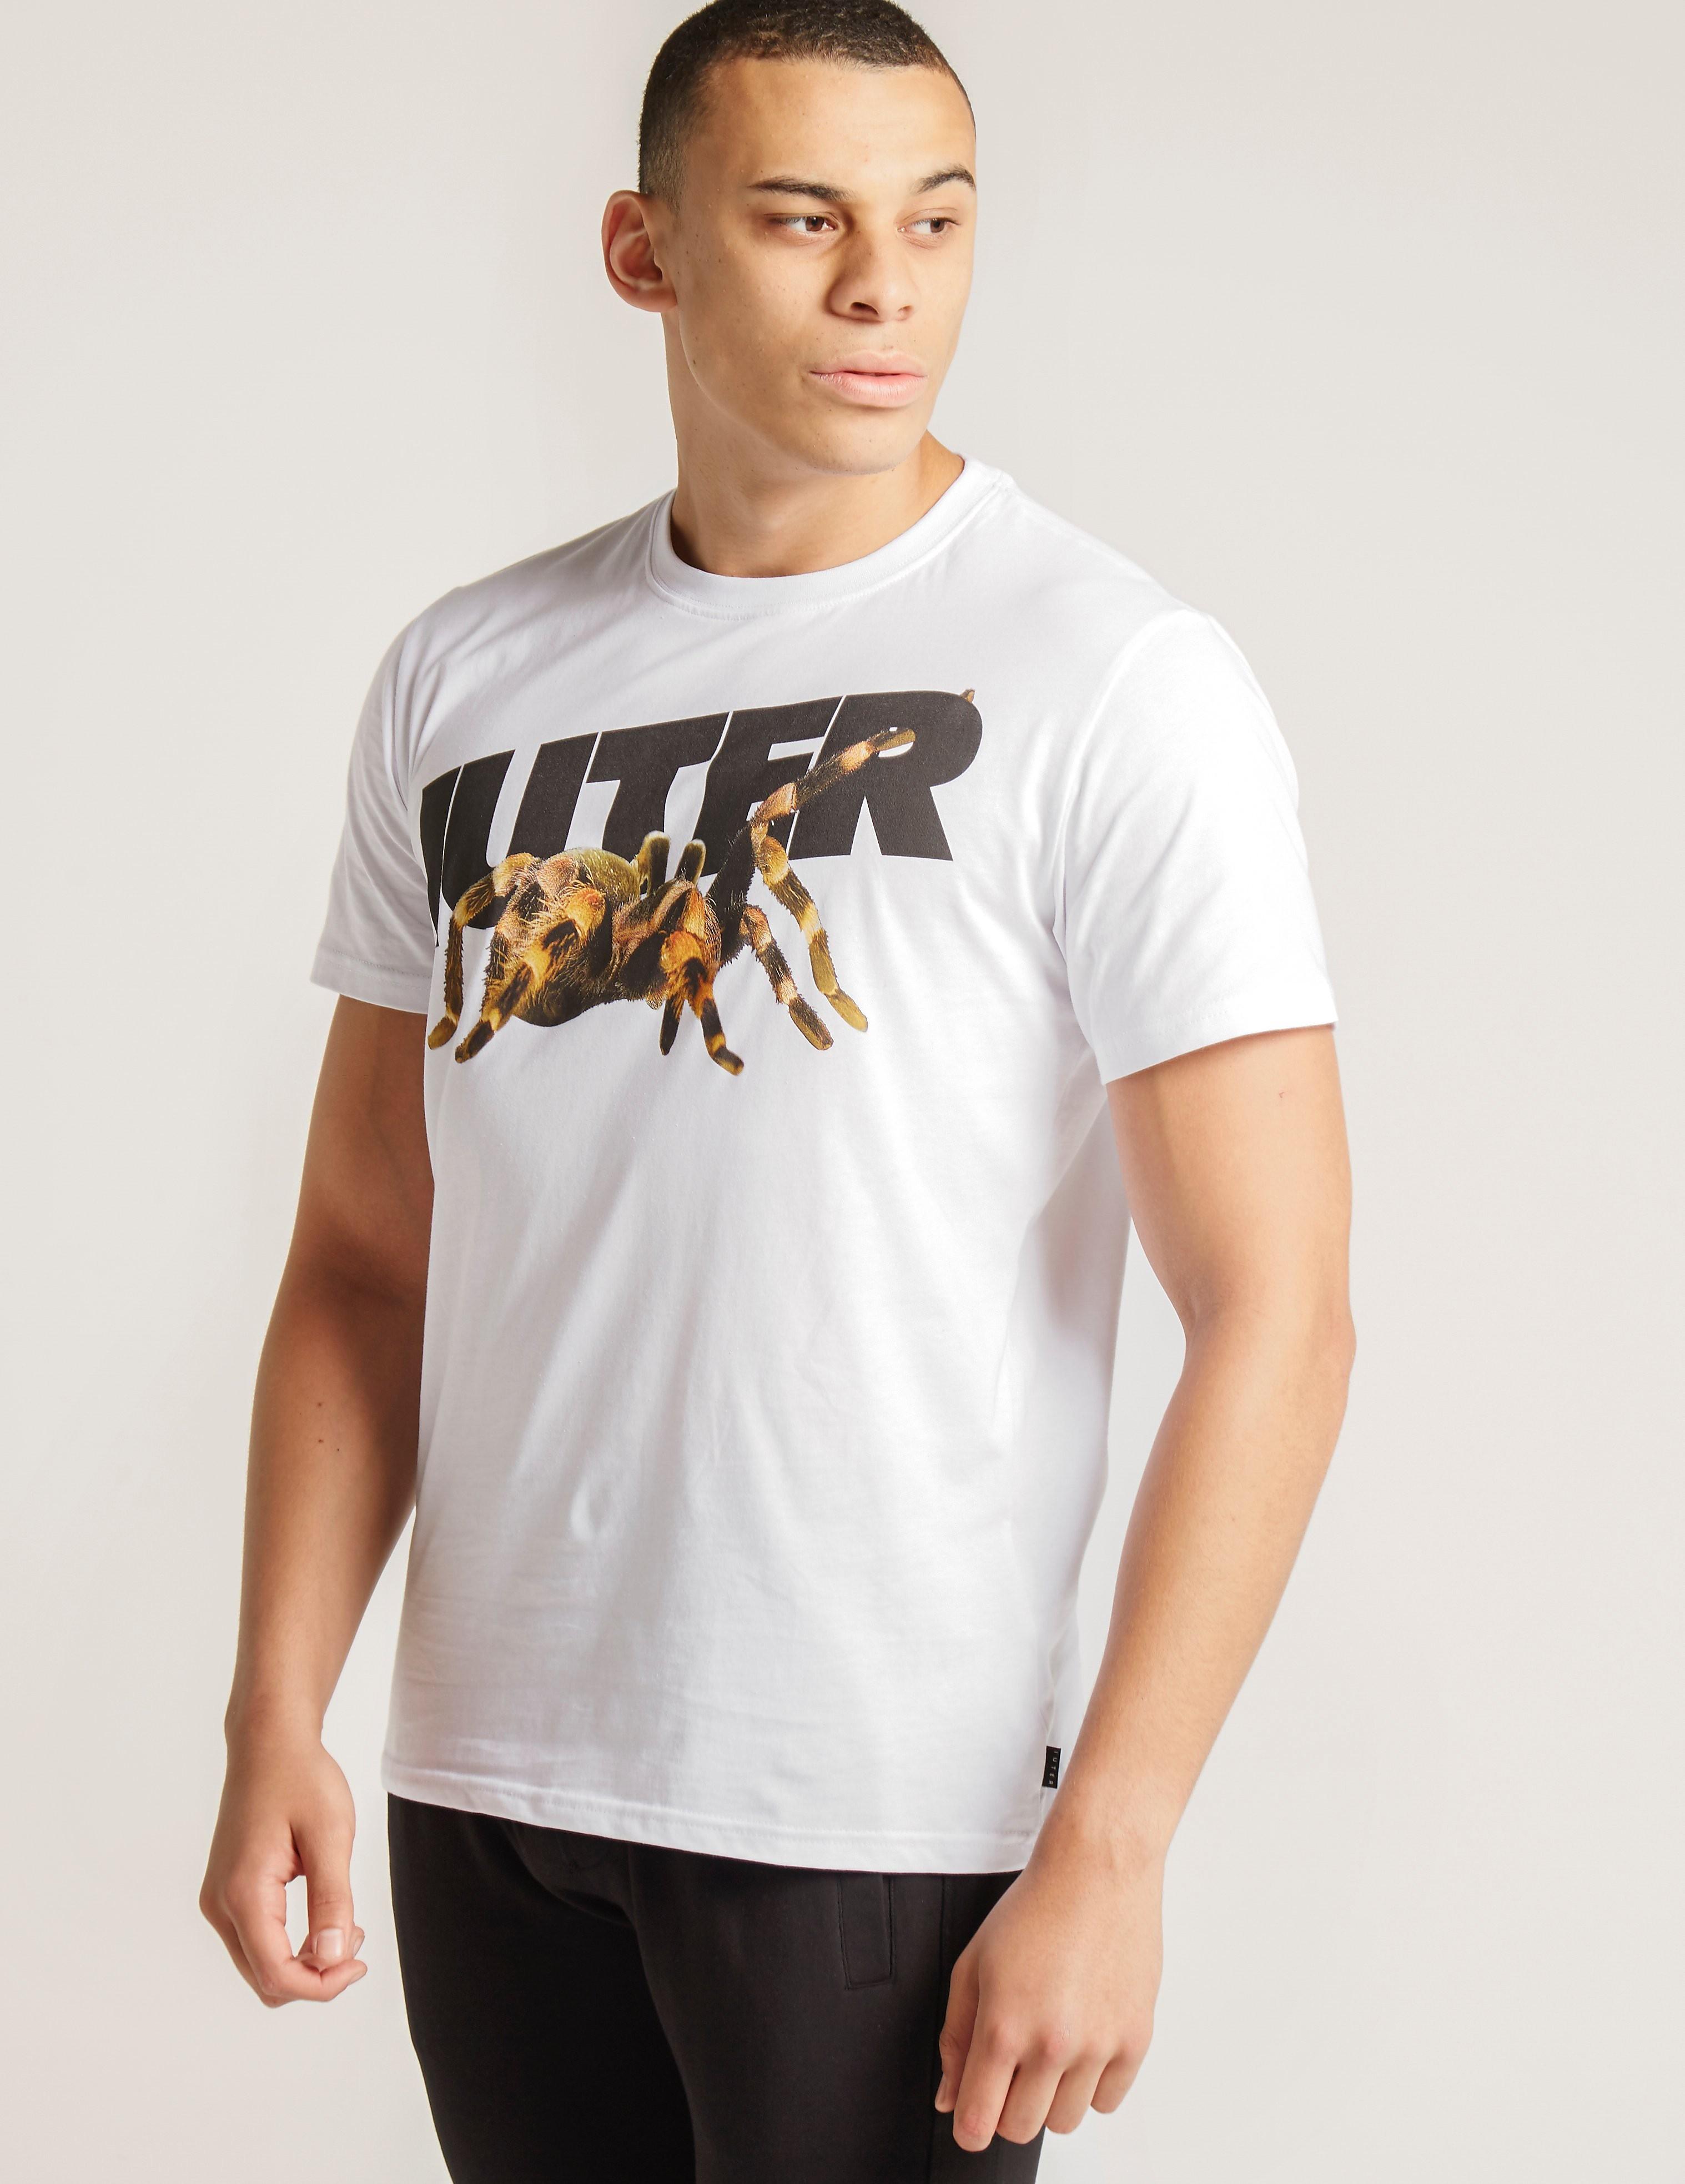 IUTER Spider T-Shirt